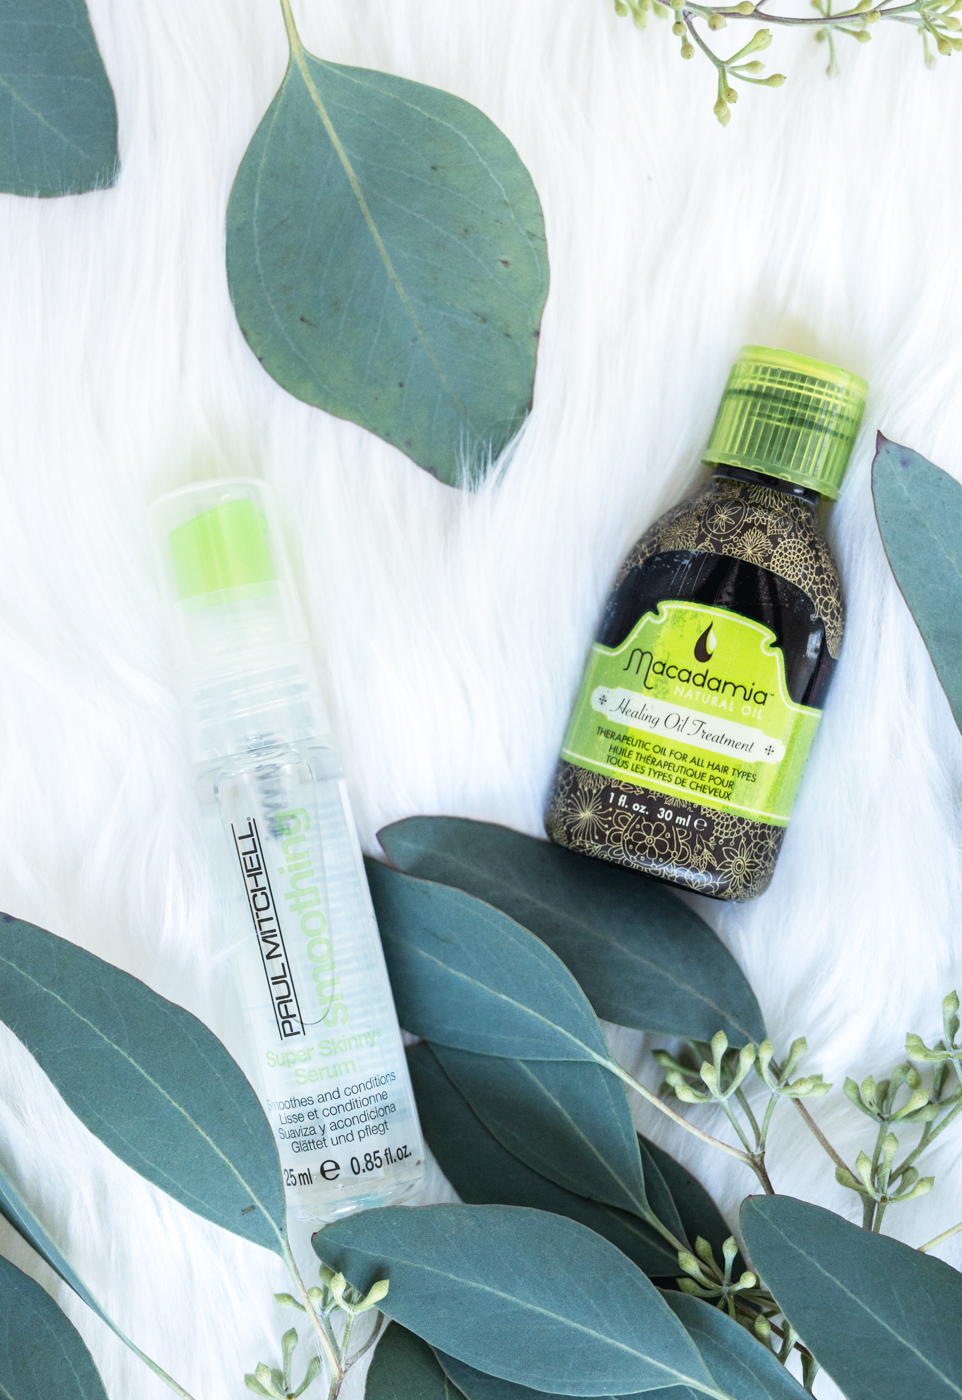 Macadamia Oil Healing Oil Treatment & Paul Mitchell Super Skinny Serum